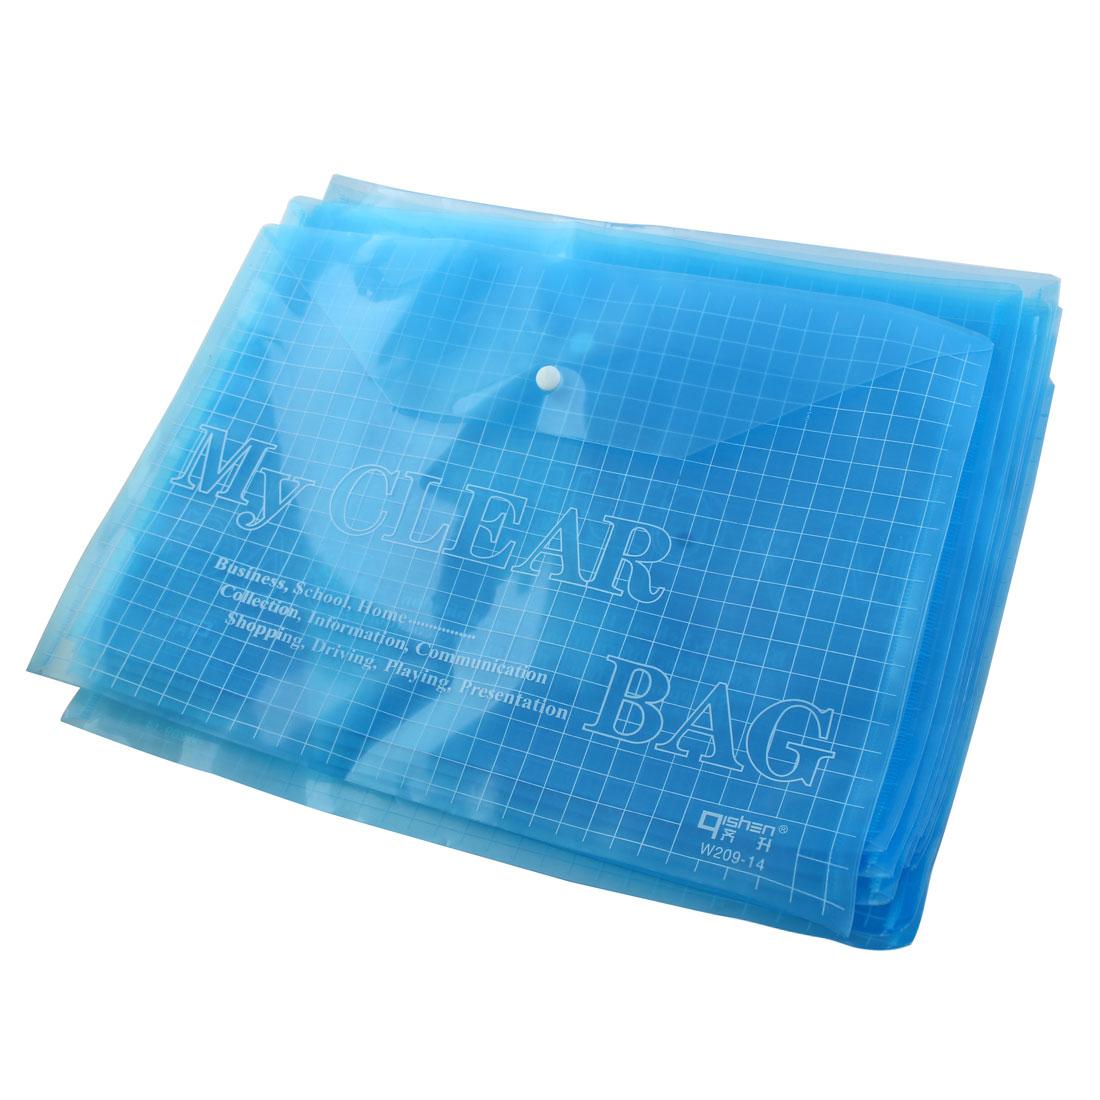 10 Pcs Press Studs Closure A4 Document File Bag Holder Blue